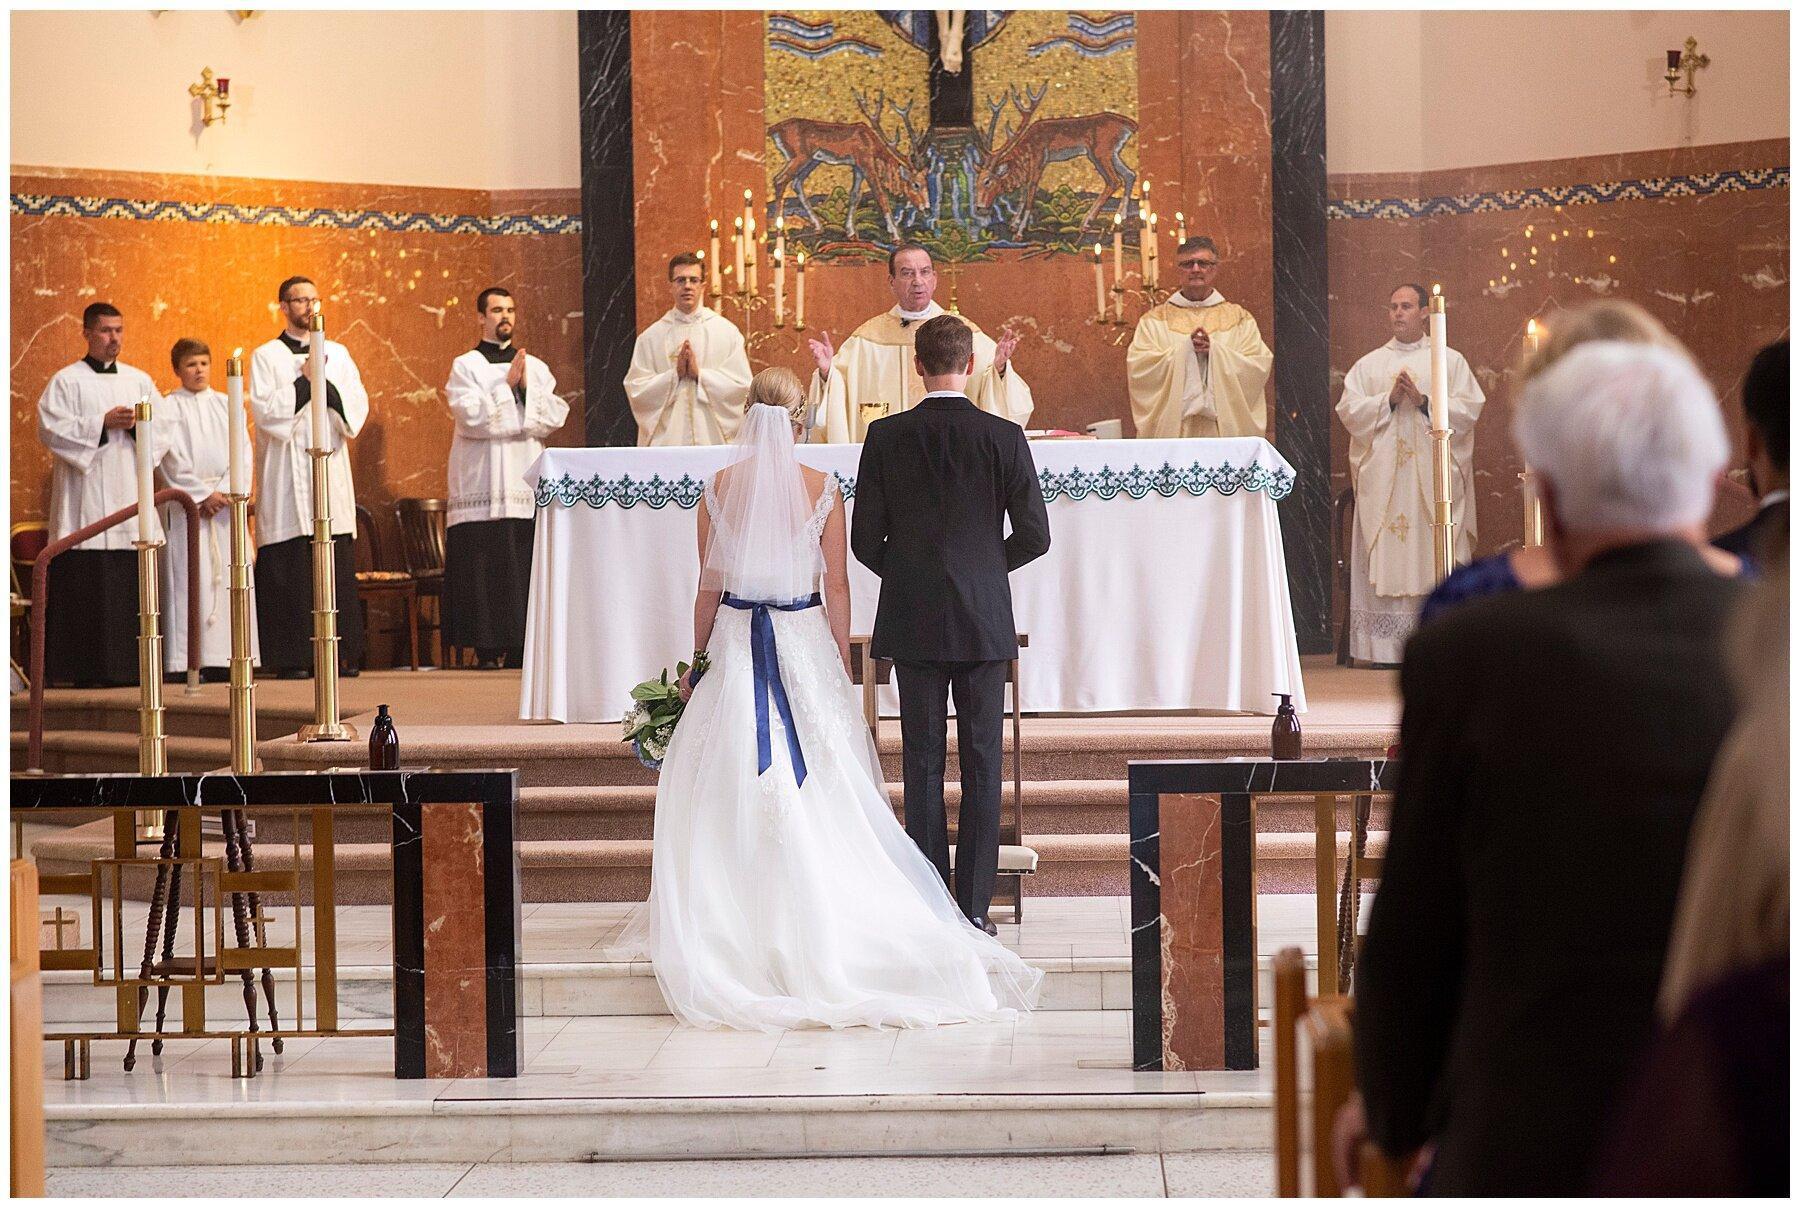 christian dating,christian dating sites,christian brides, christian, best christian dating site for marriage, best christian dating site for over 50